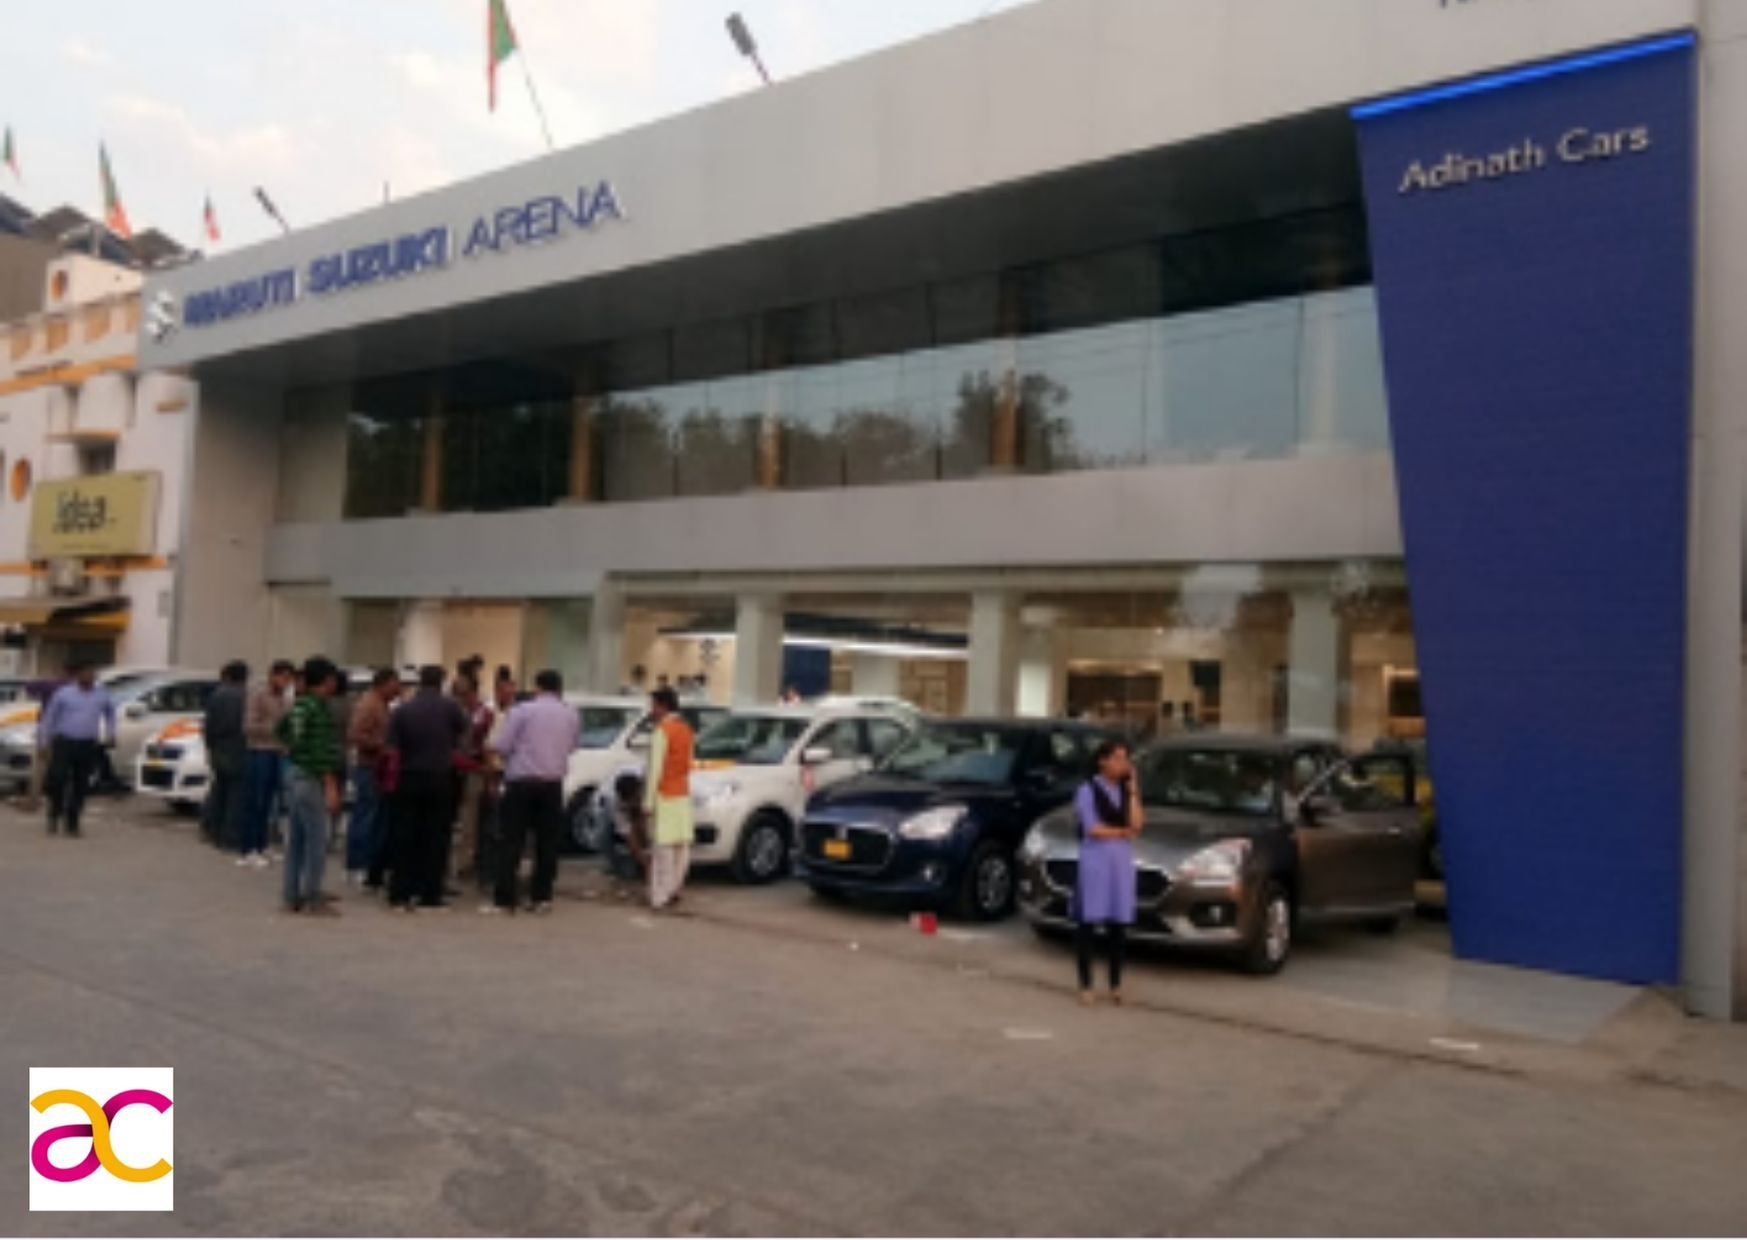 Searching Maruti Suzuki Showroom In Sagar Then Visit Adinath Cars In 2020 Dream Cars Premium Cars Car Dealer